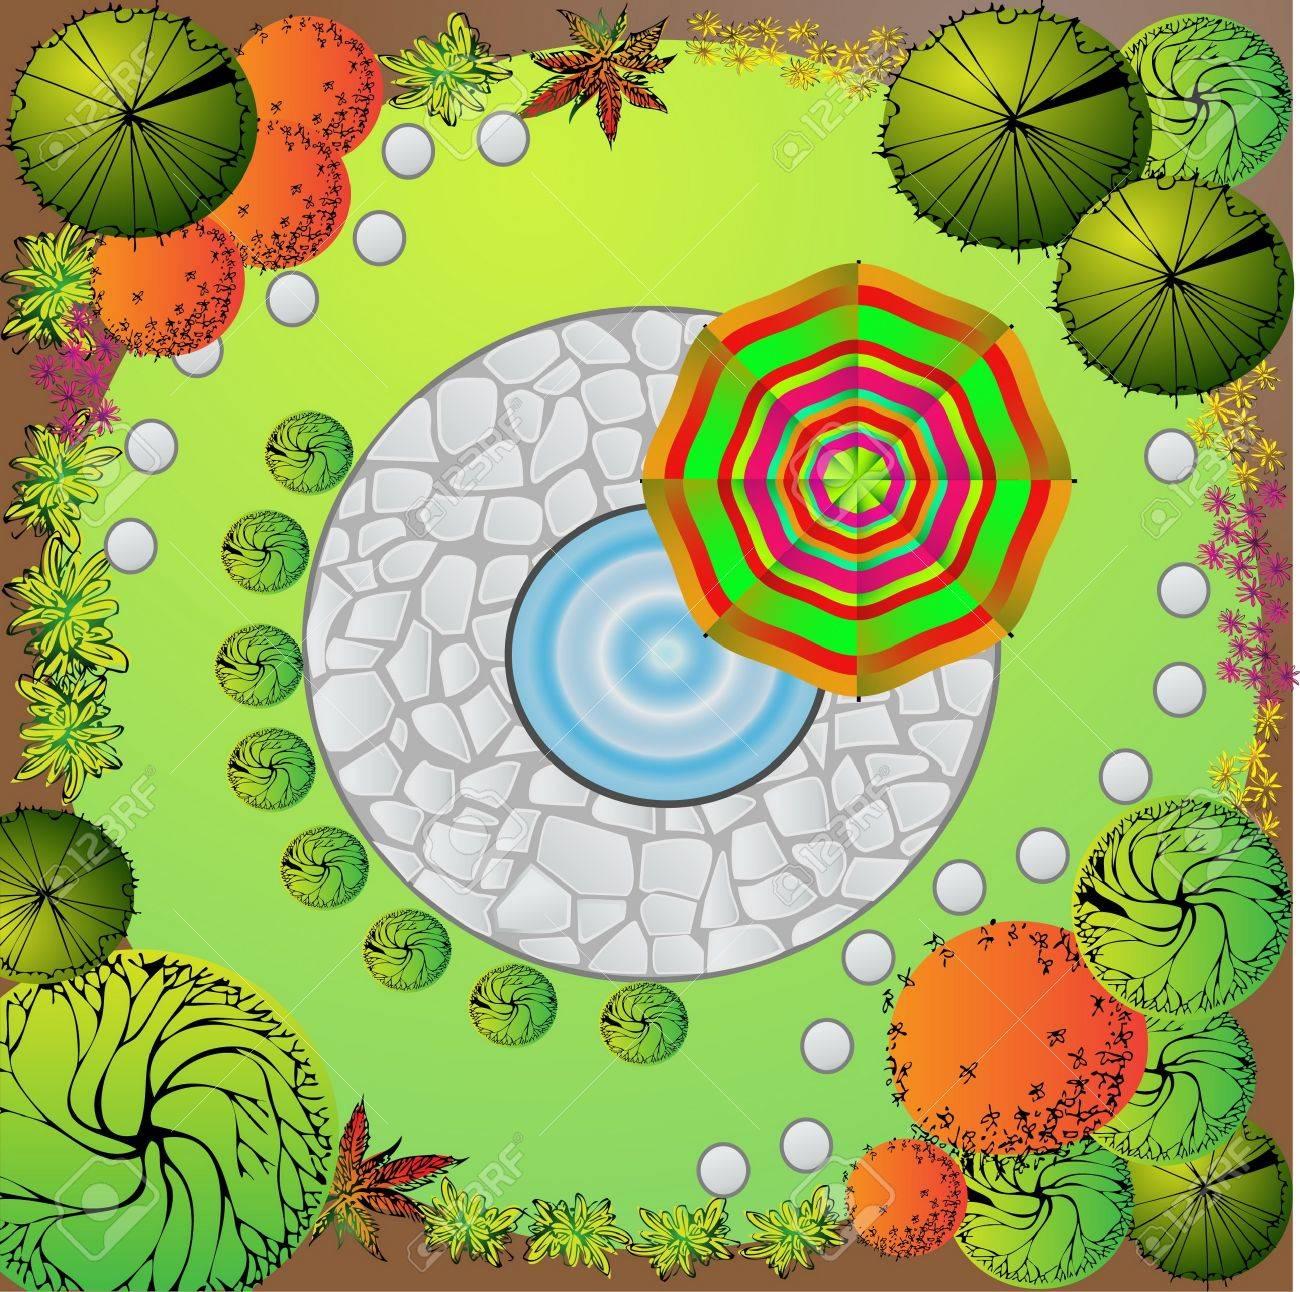 Colored Plan of garden decorative plants Stock Vector - 9923560